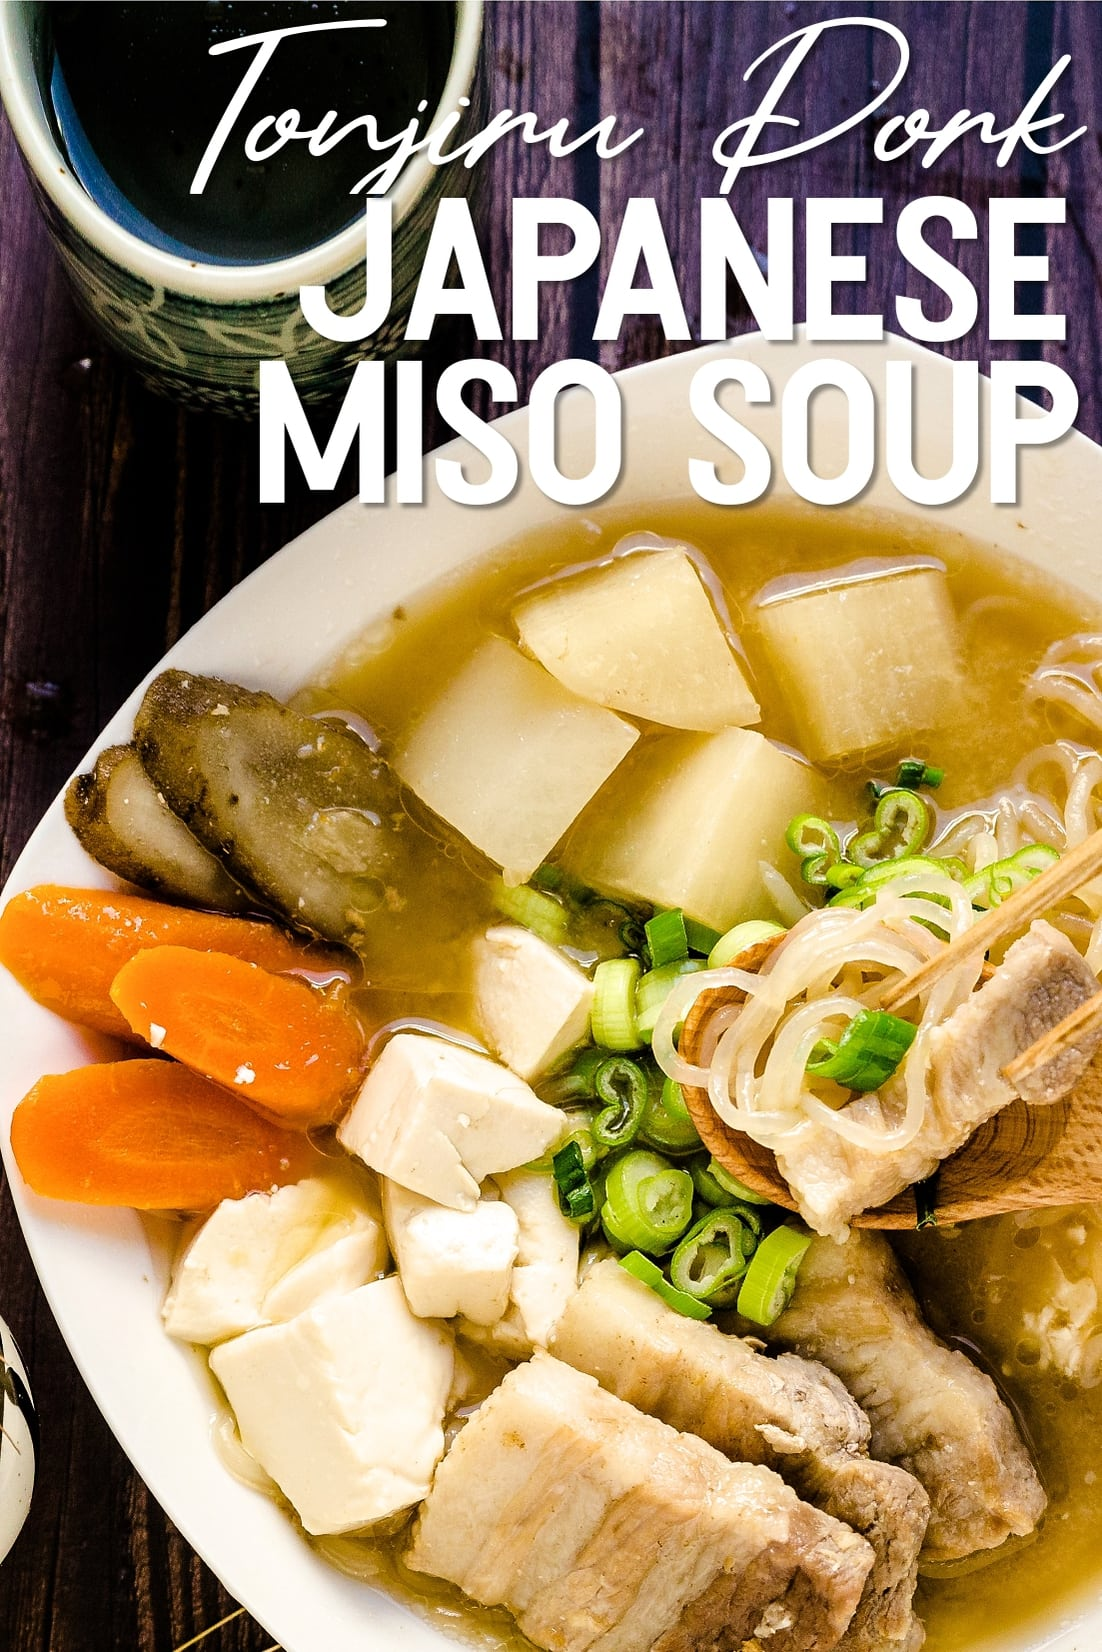 Tonjiru Pork Miso Soup with chopsticks